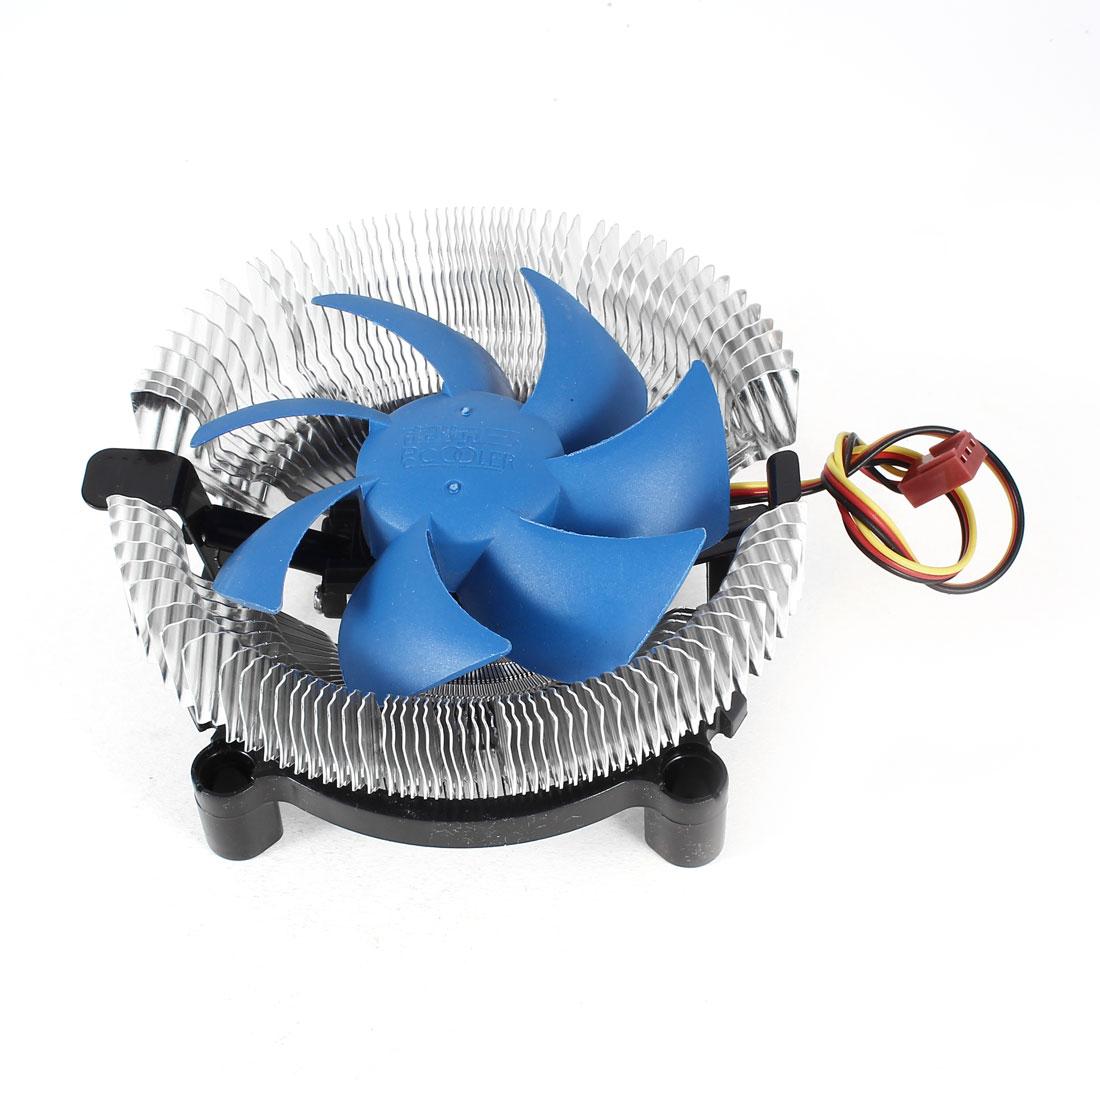 Silver Tone PC CPU Cooling Fan Cooler Heatsink 3 Terminals for Intel LGA775 LGA 1156